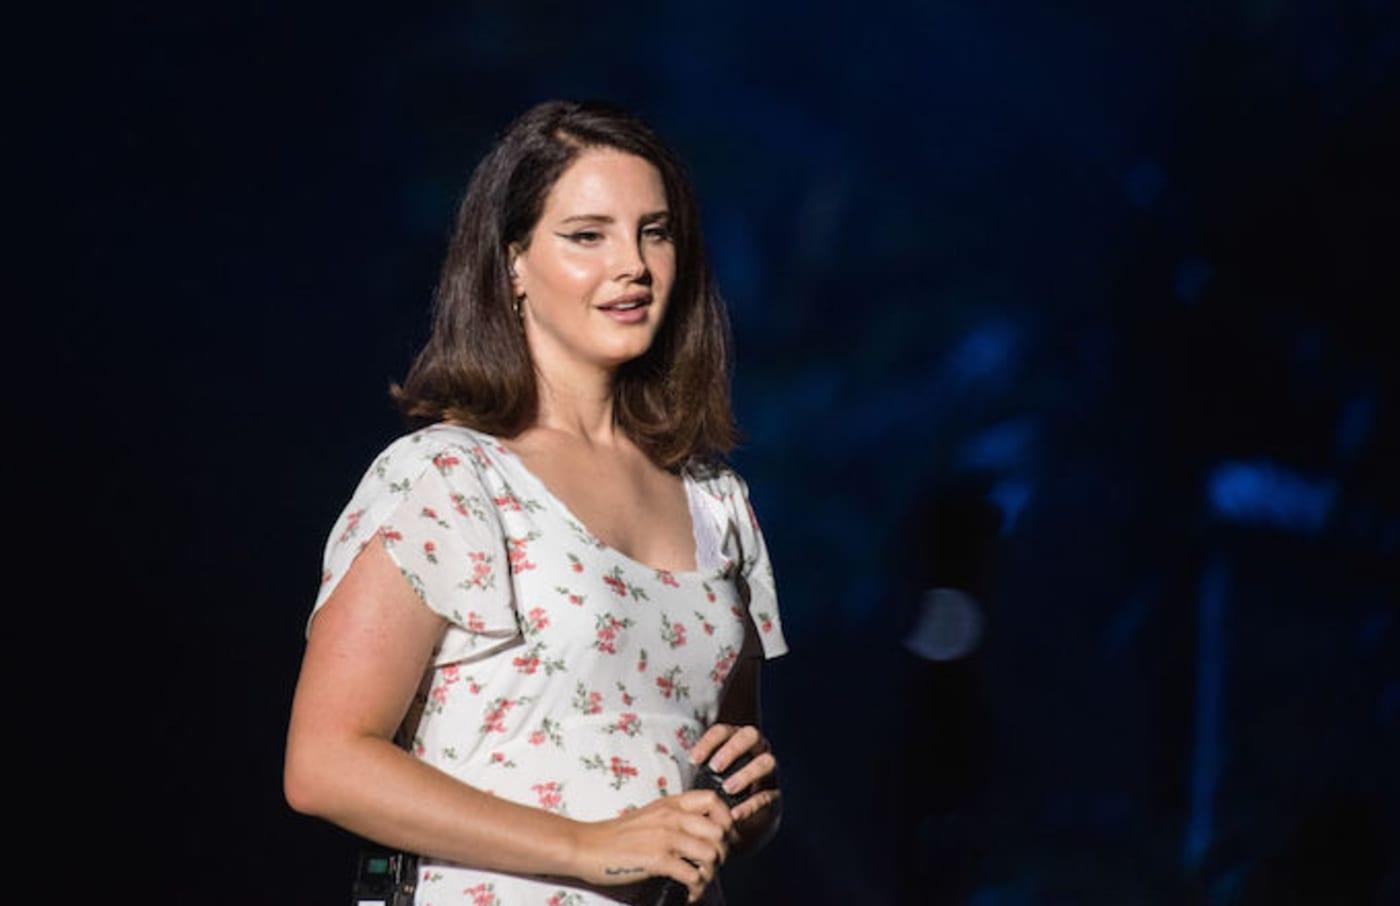 Lana Del Rey stalker